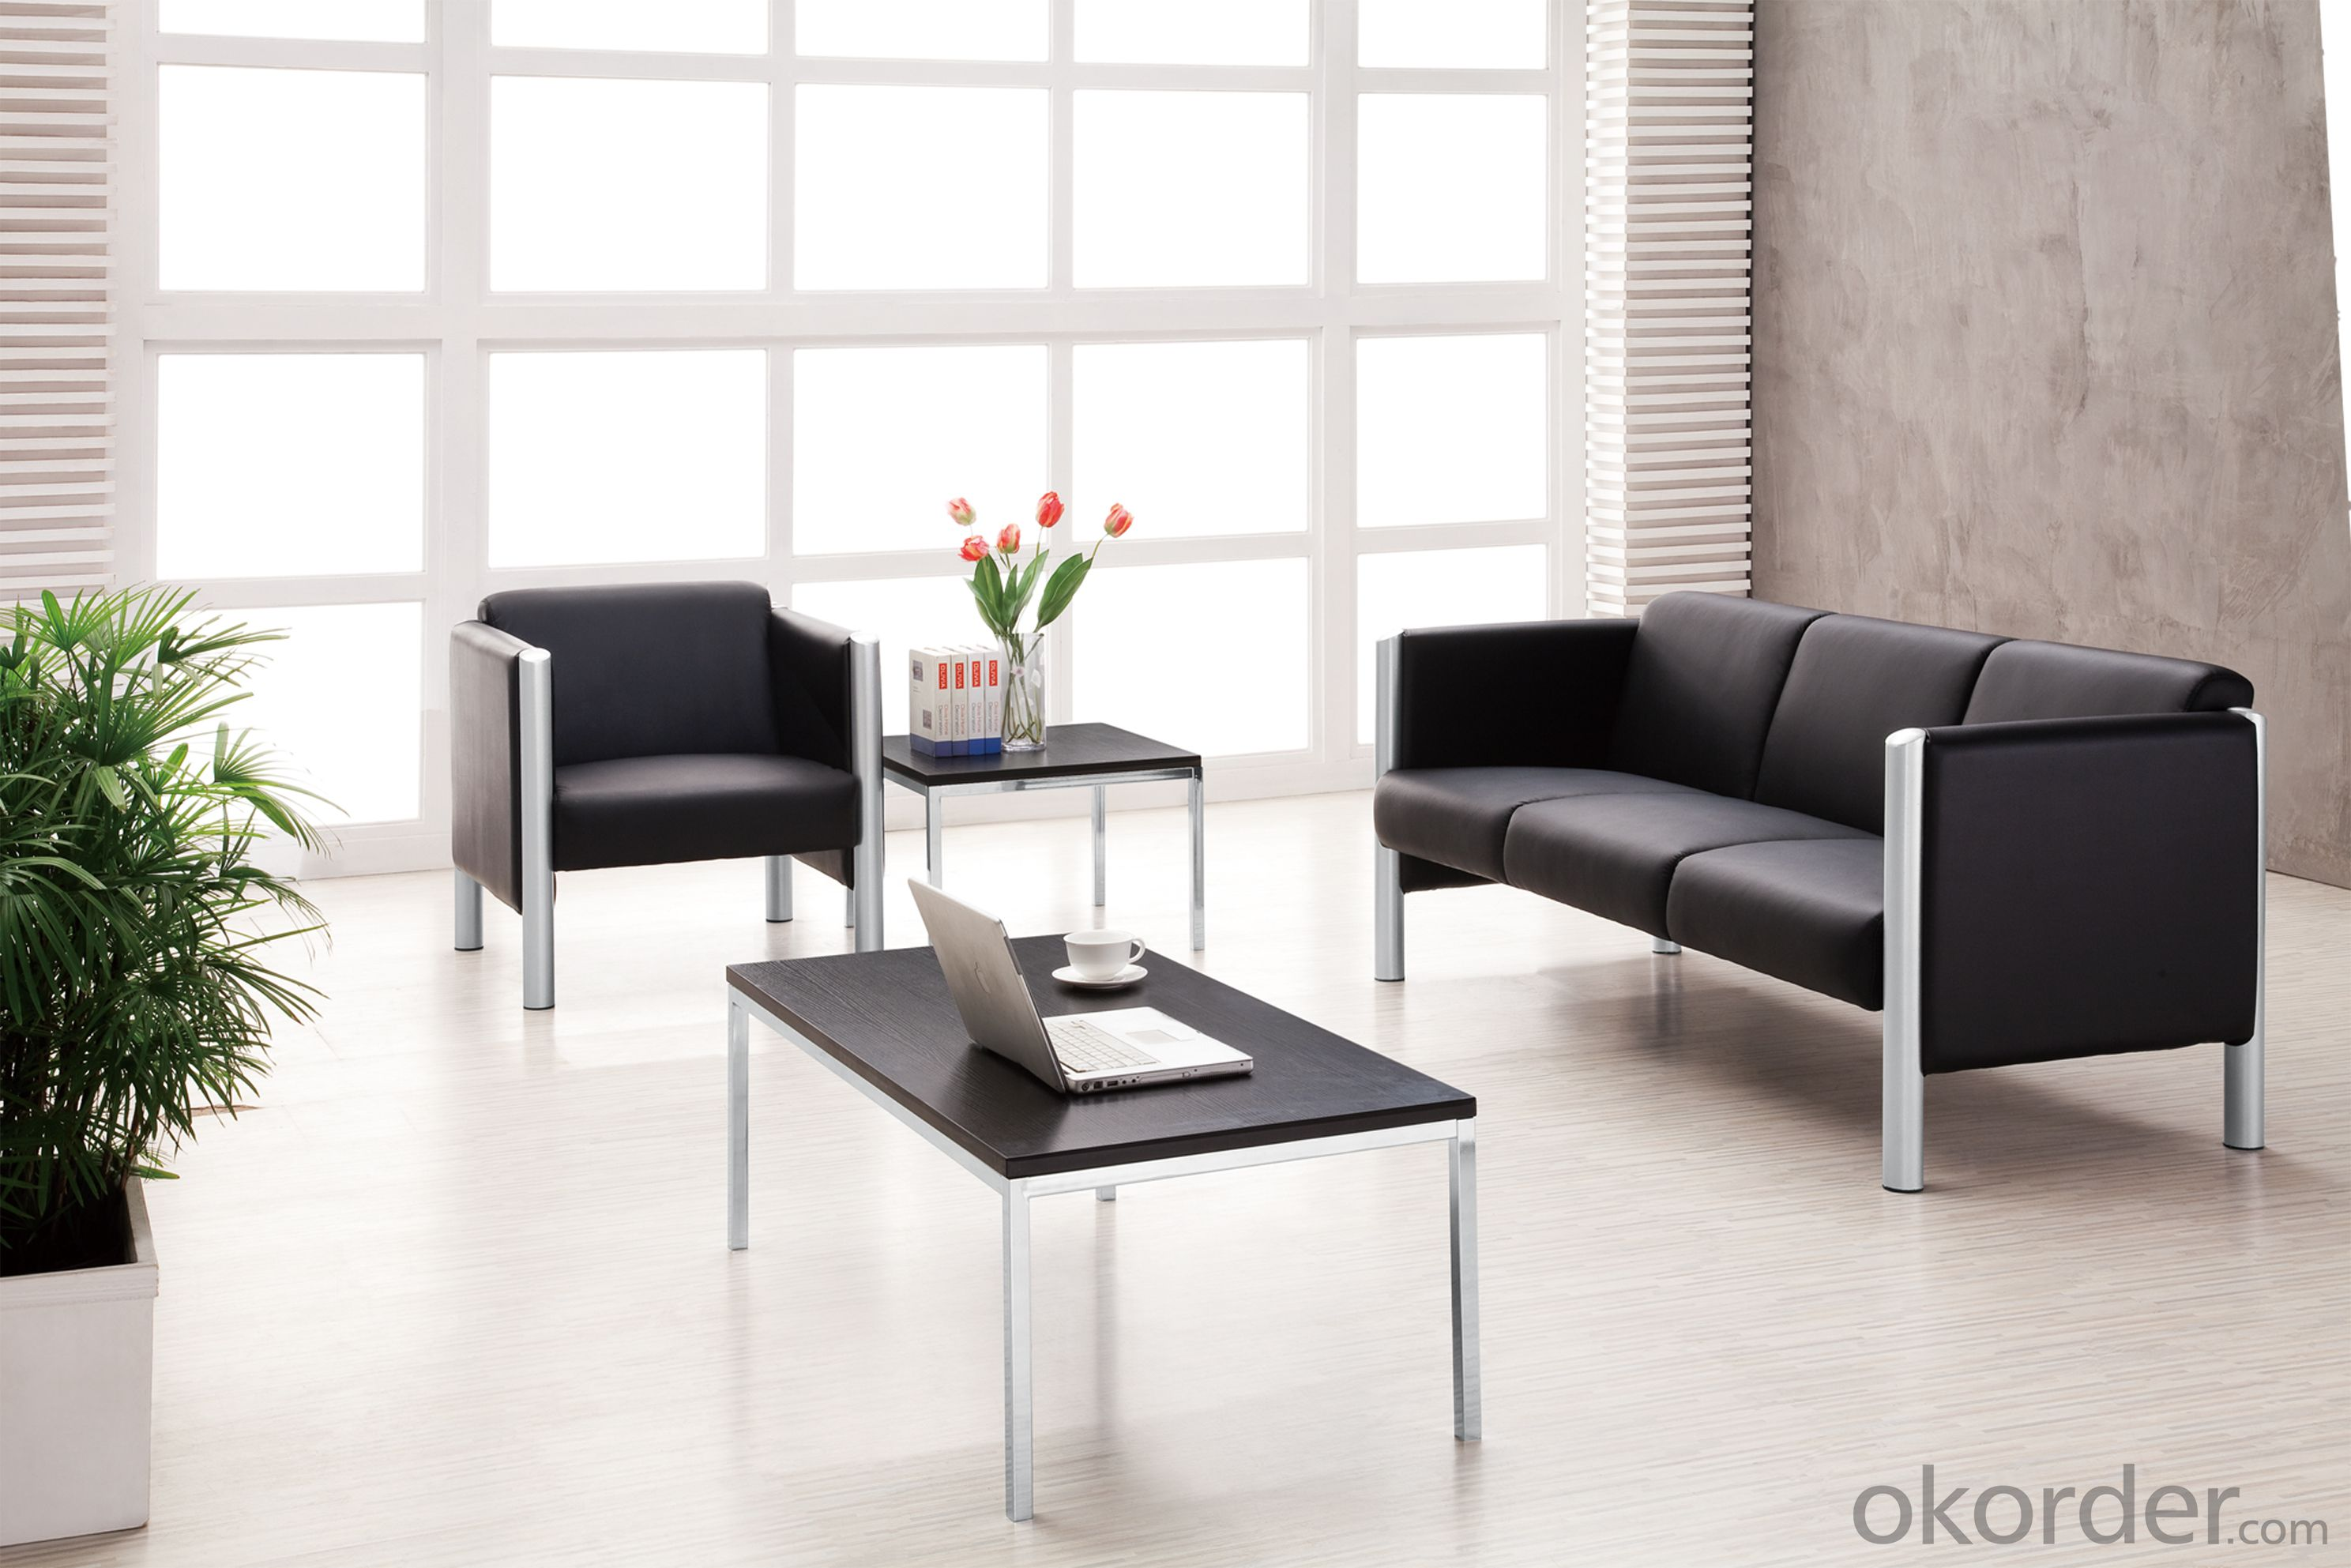 Modern living room fabric sofa furniture A9927